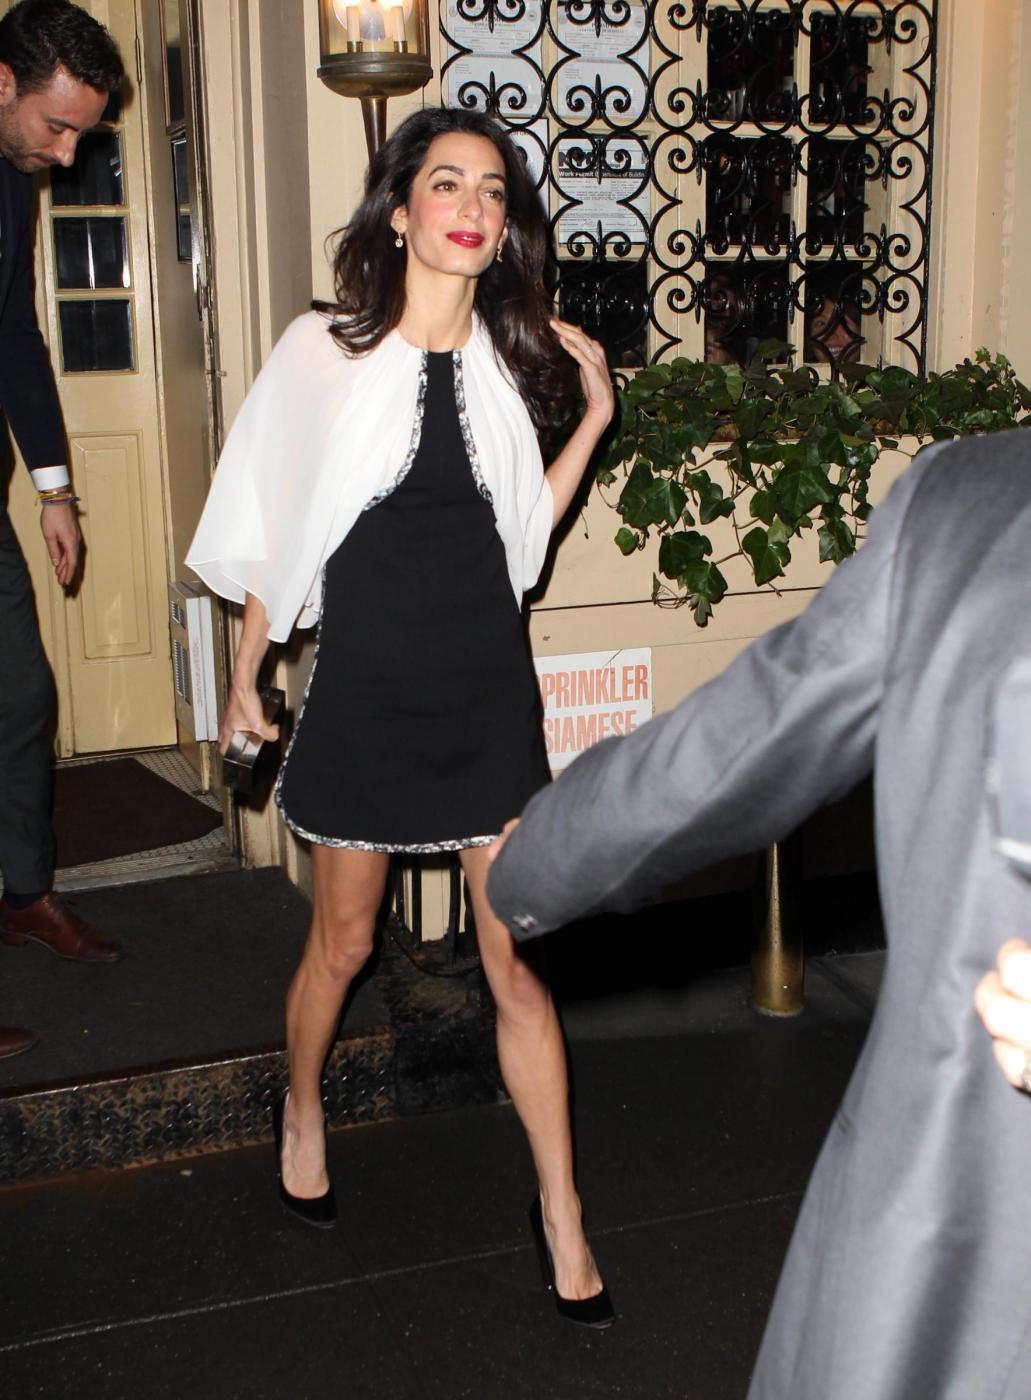 Amal Alamuddin magrissima, lady Clooney quasi scheletrica FOTO 13